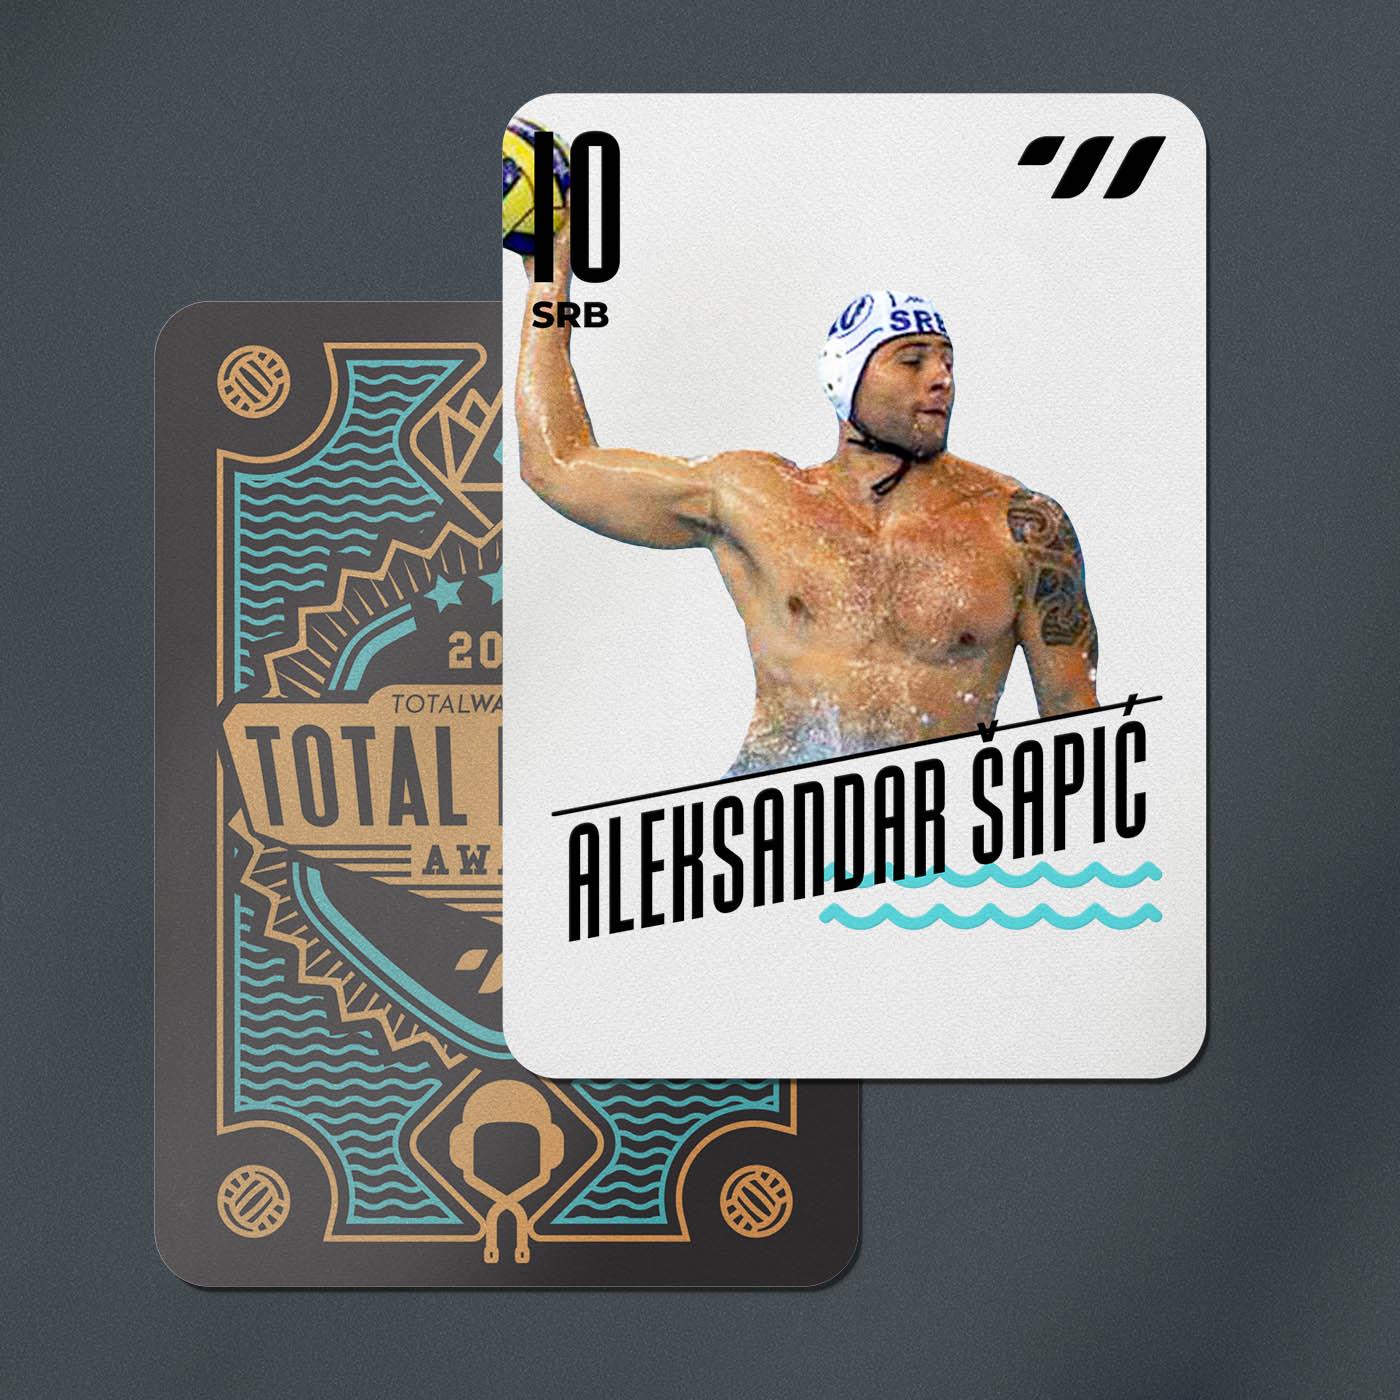 LEFT WING - Aleksandar Sapic (SRB)